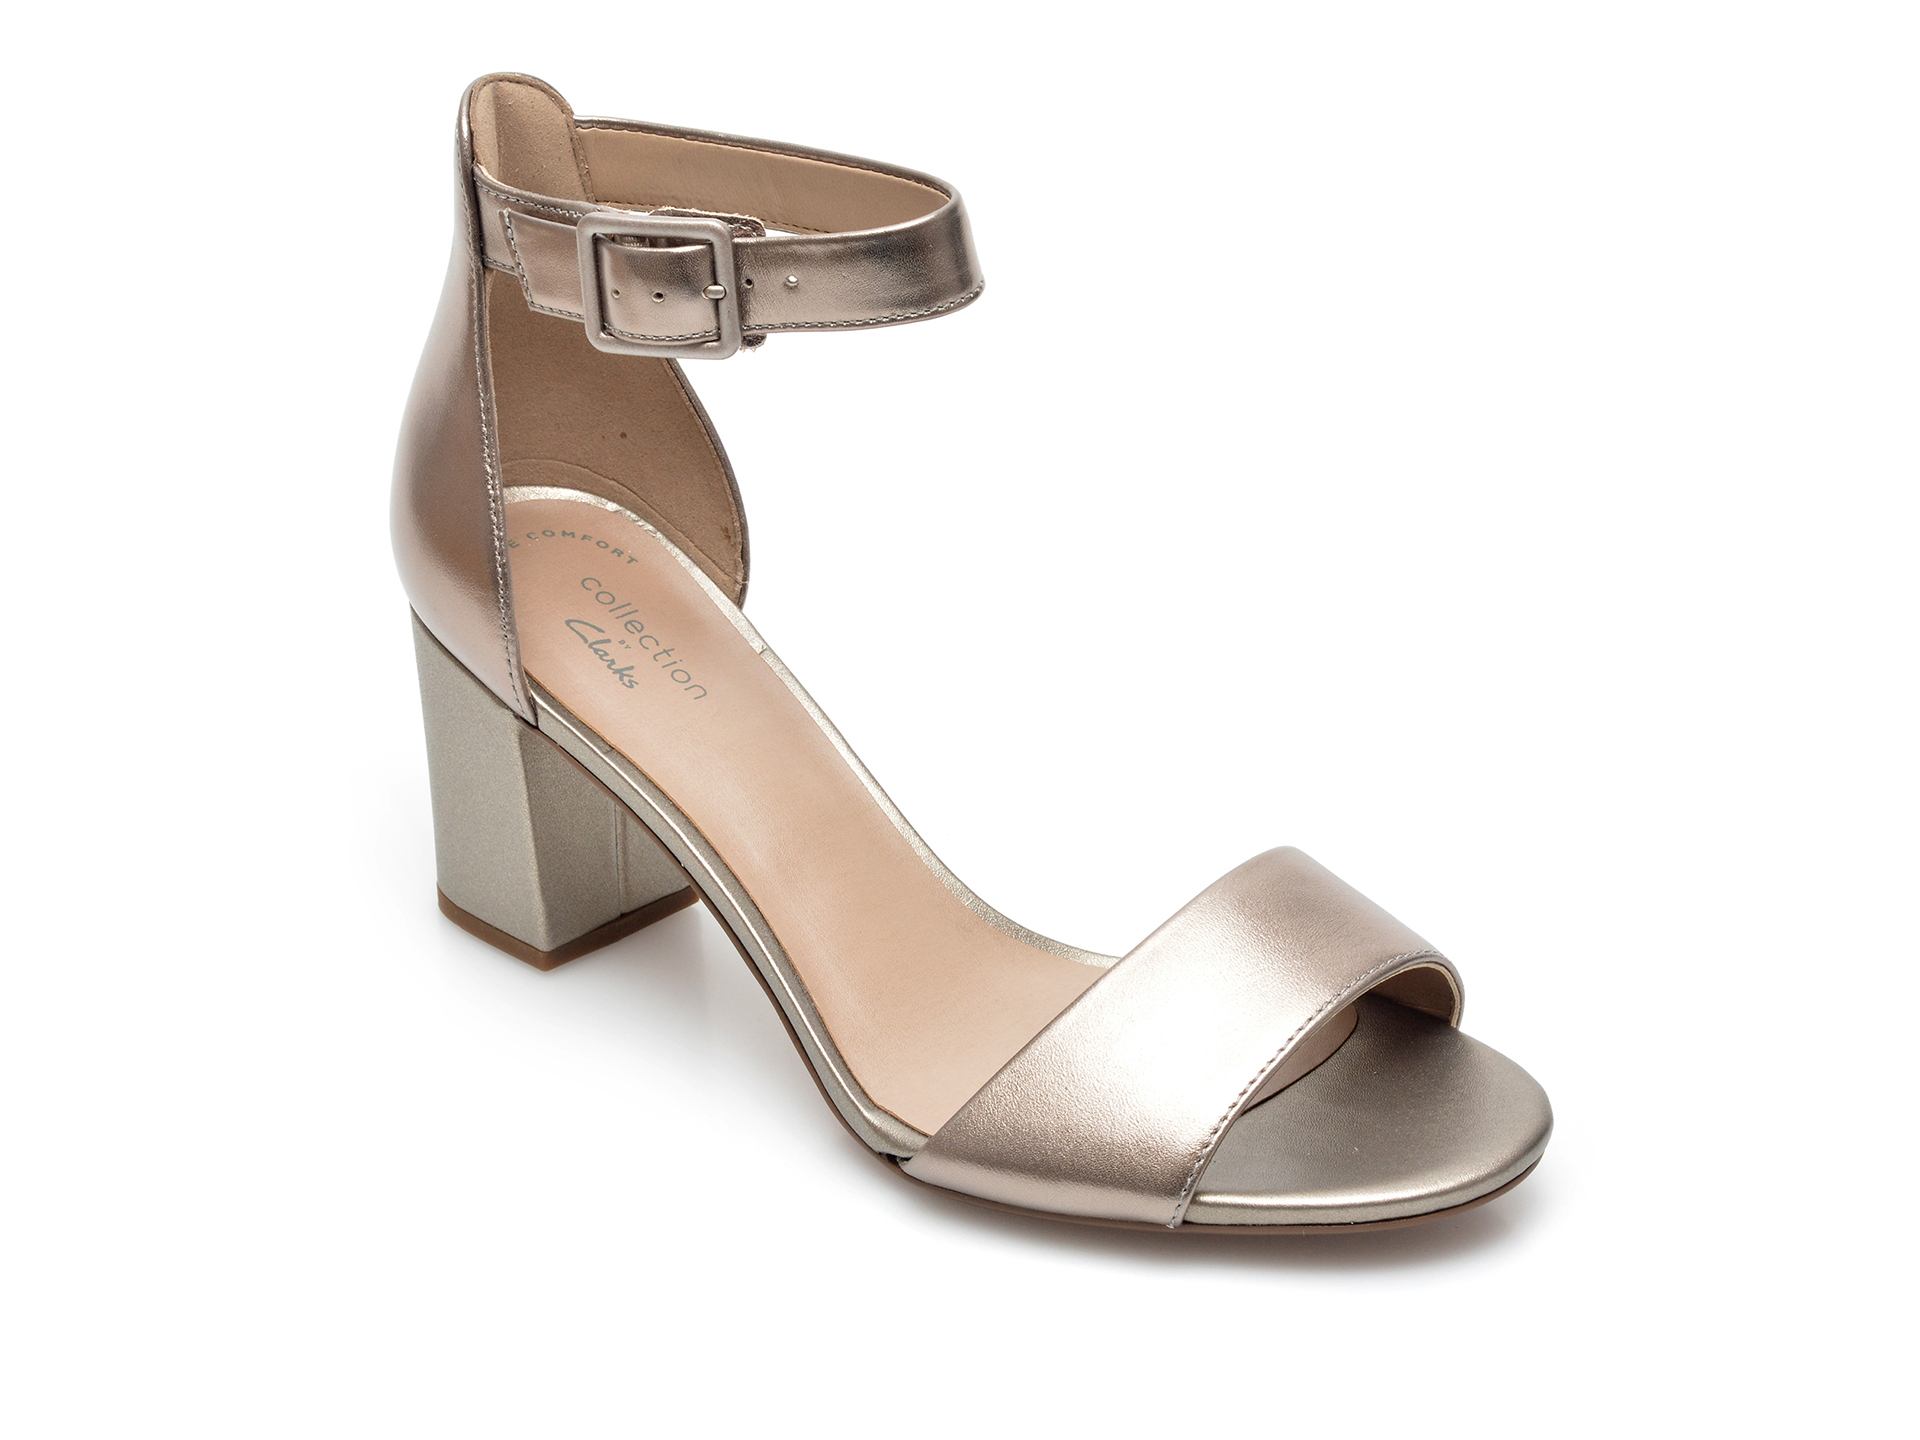 Sandale CLARKS aurii, Deva Mae, din piele naturala imagine otter.ro 2021